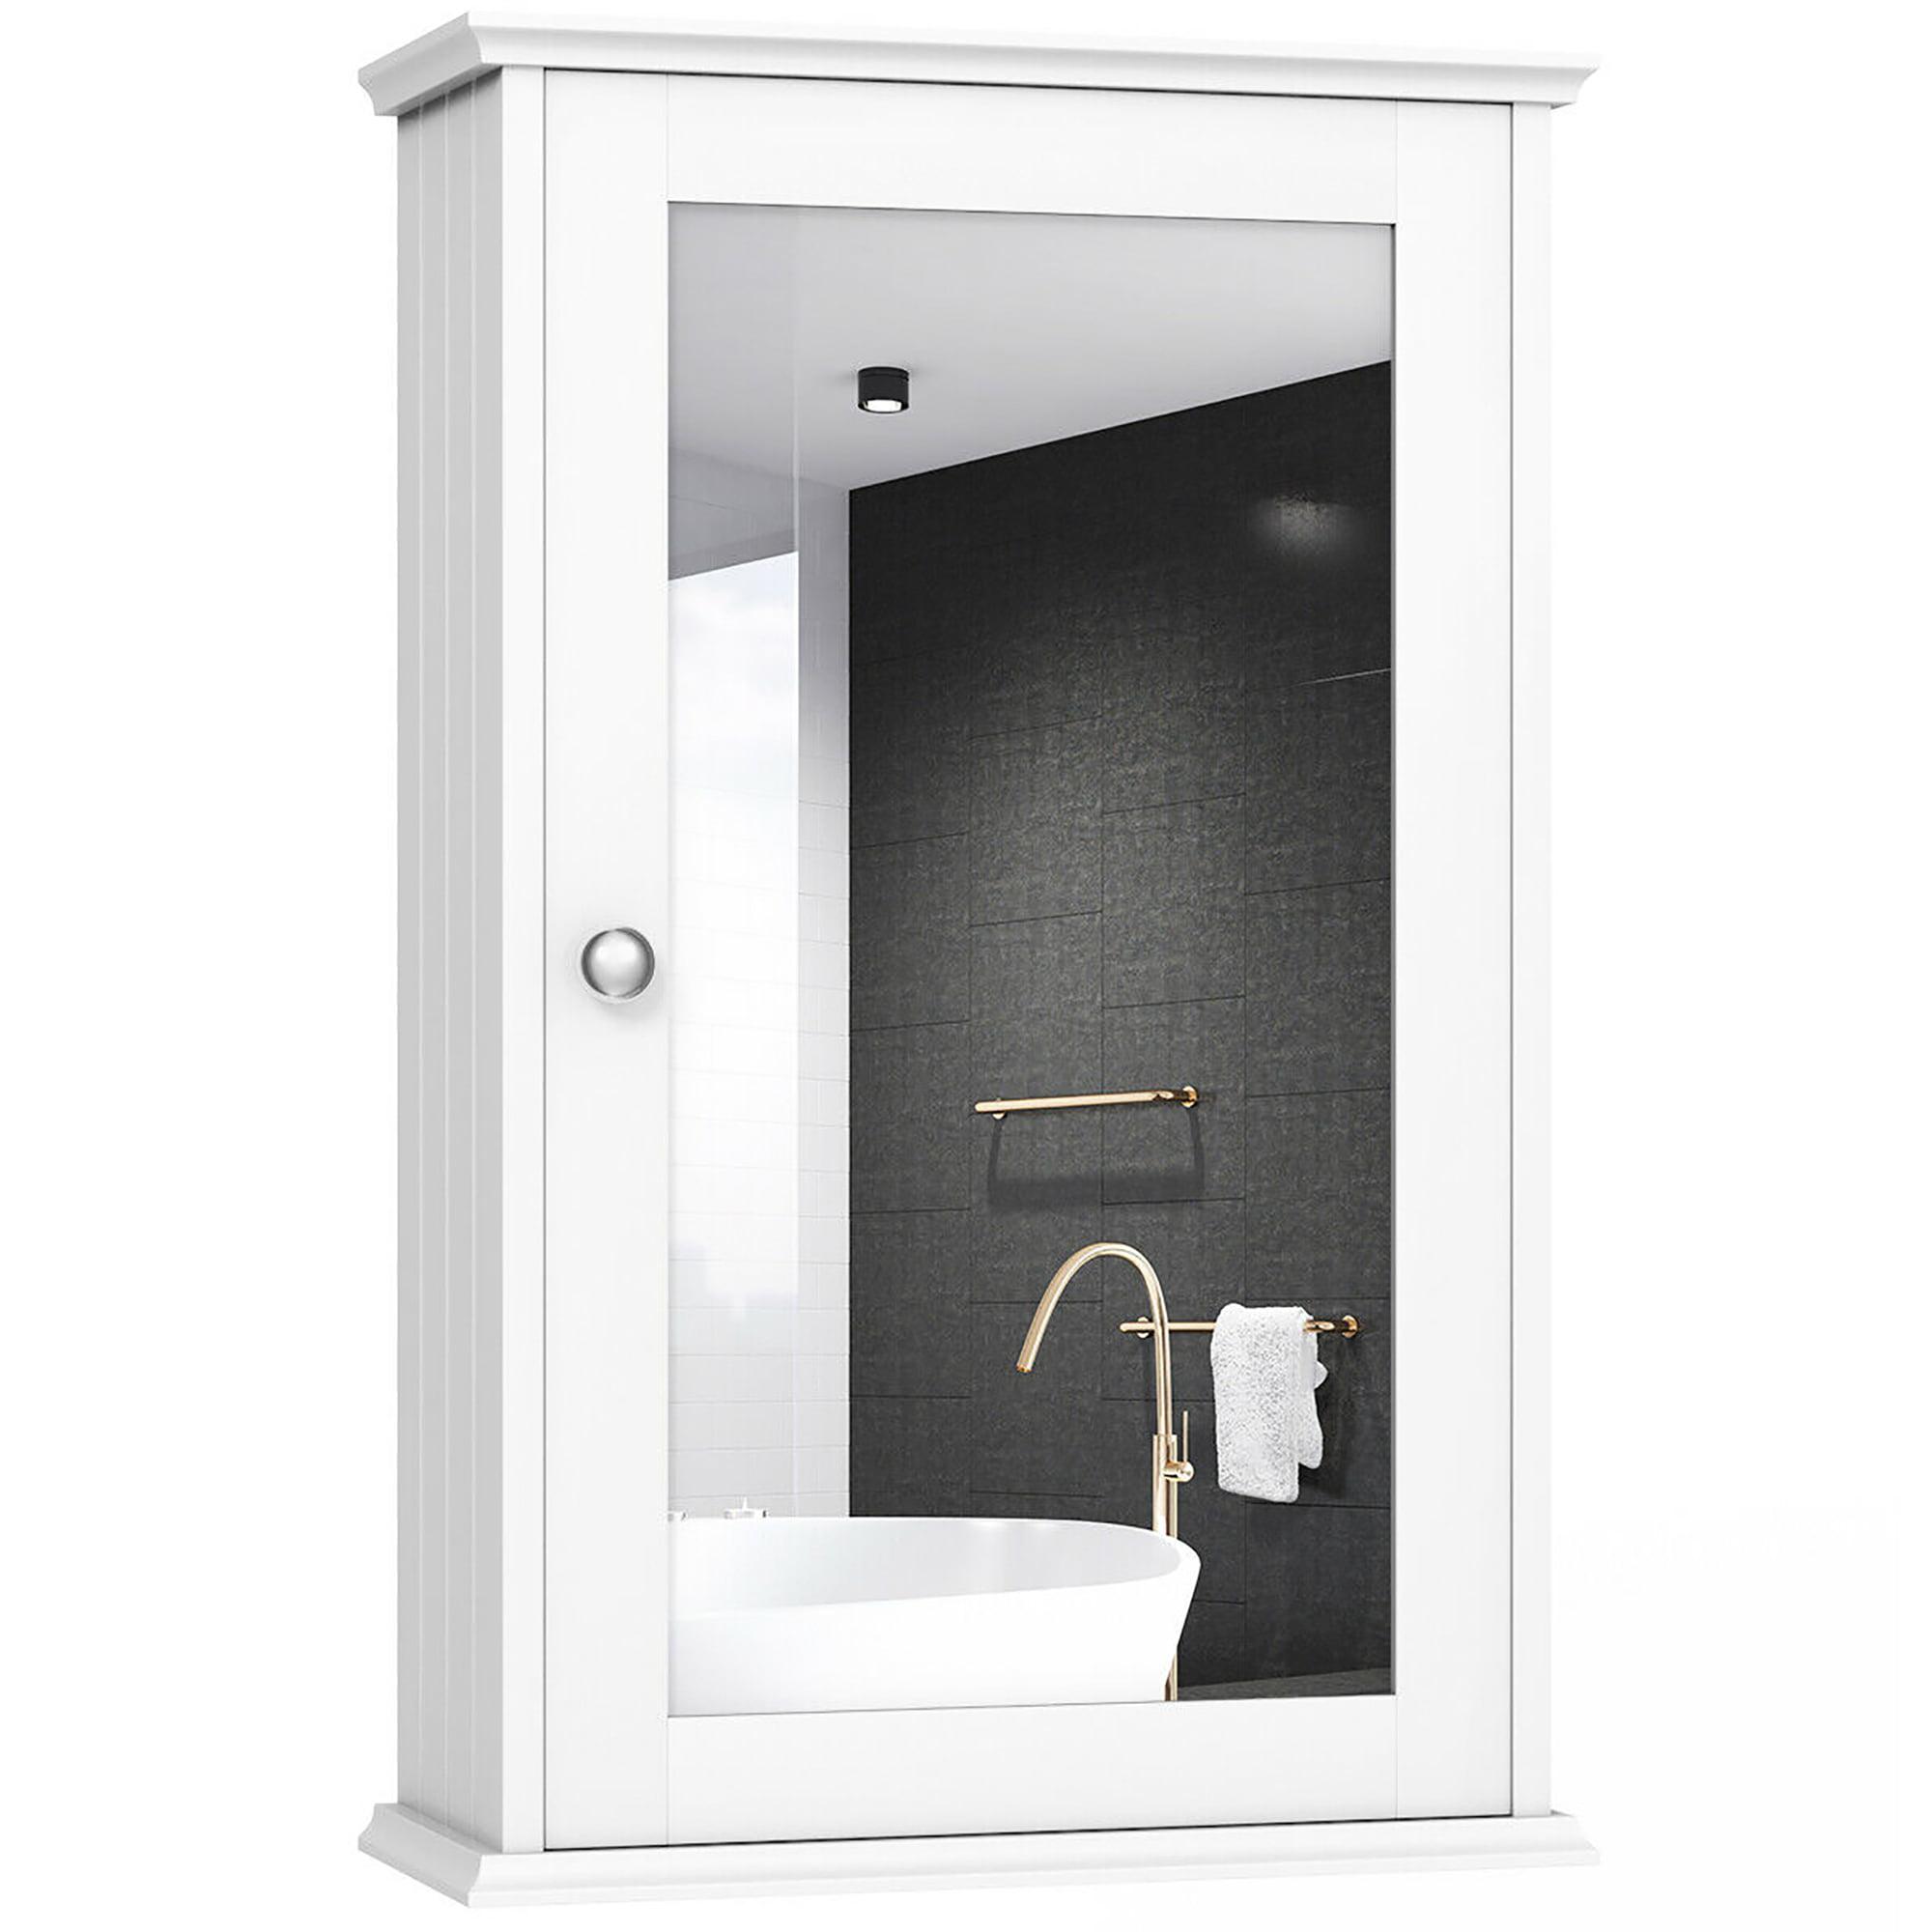 costway new bathroom wall cabinet single mirror door